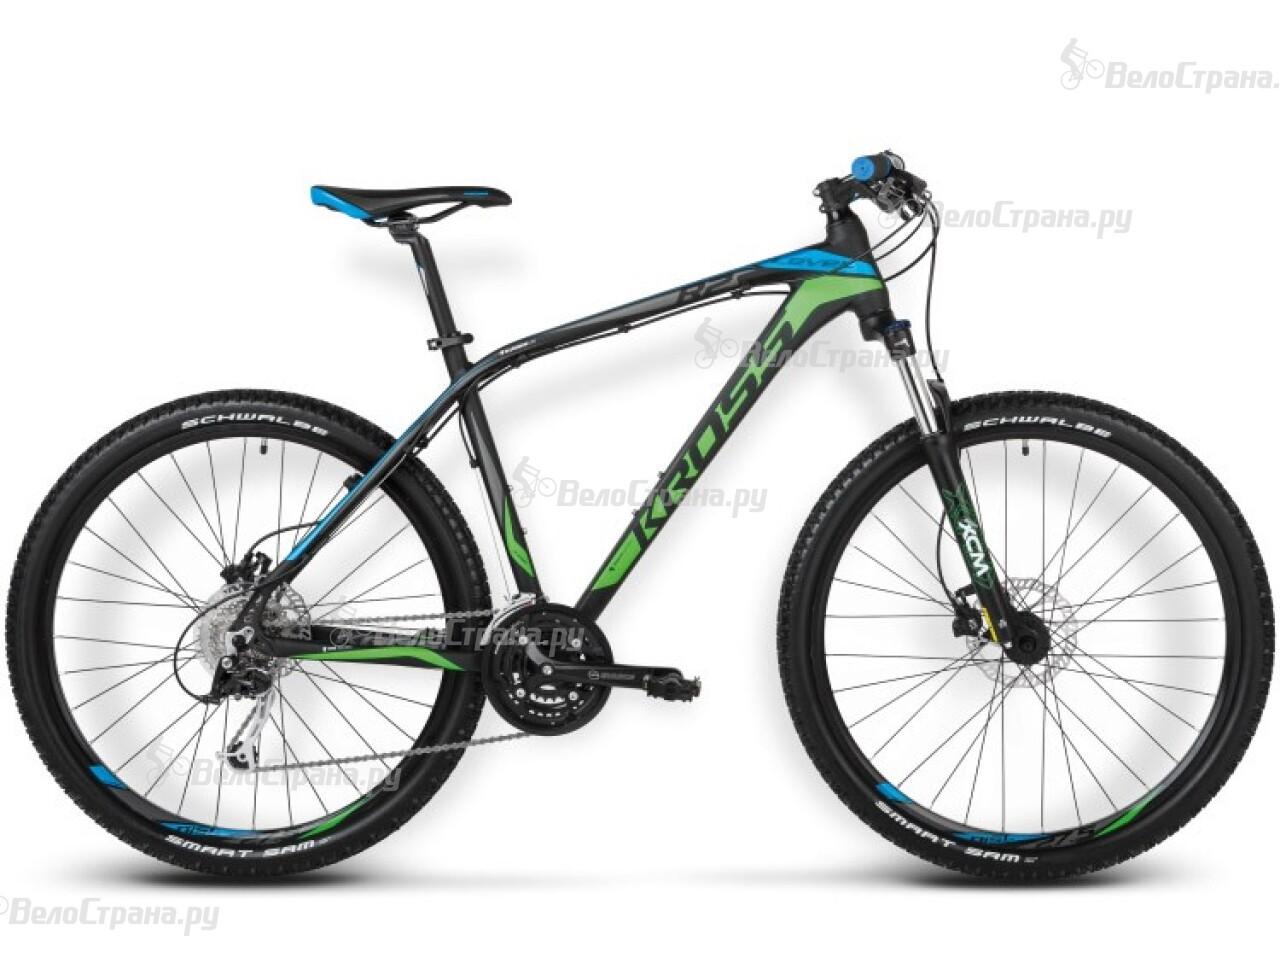 Велосипед Kross Level R2 (2015) r2 westbrook одежда